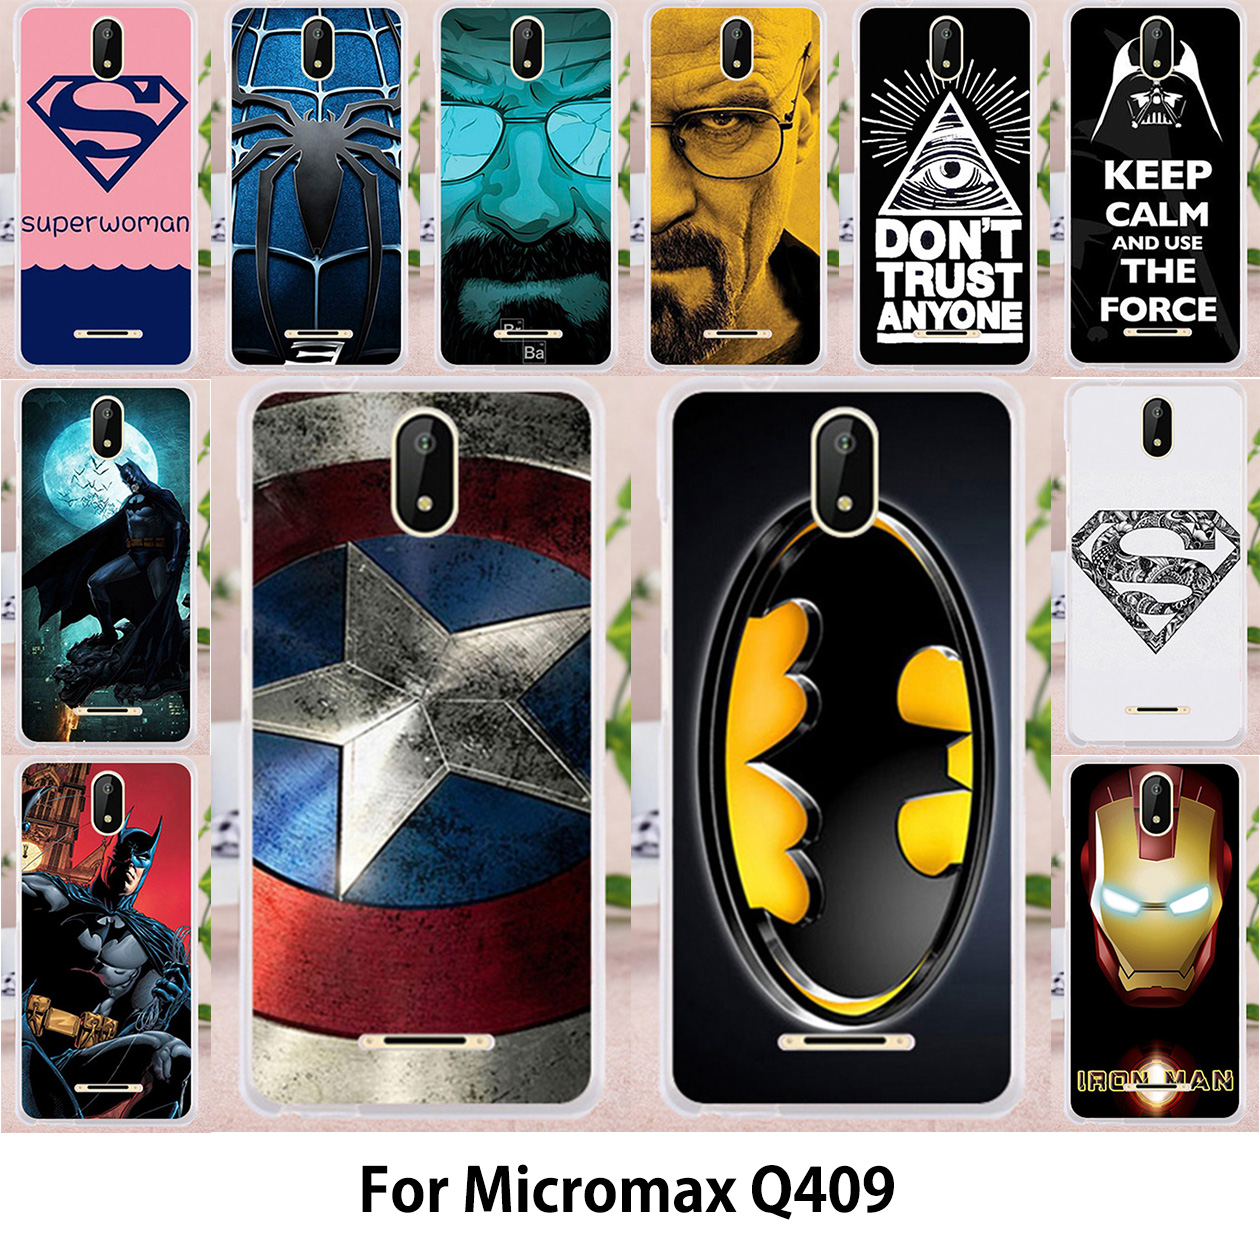 TAOYUNXI Case For Micromax Bolt Supreme 6 Q409 Micromax Q409 Spark Cases  Silicone TPU Soft Covers Captain American Cover Bags 333e90f3e6a6